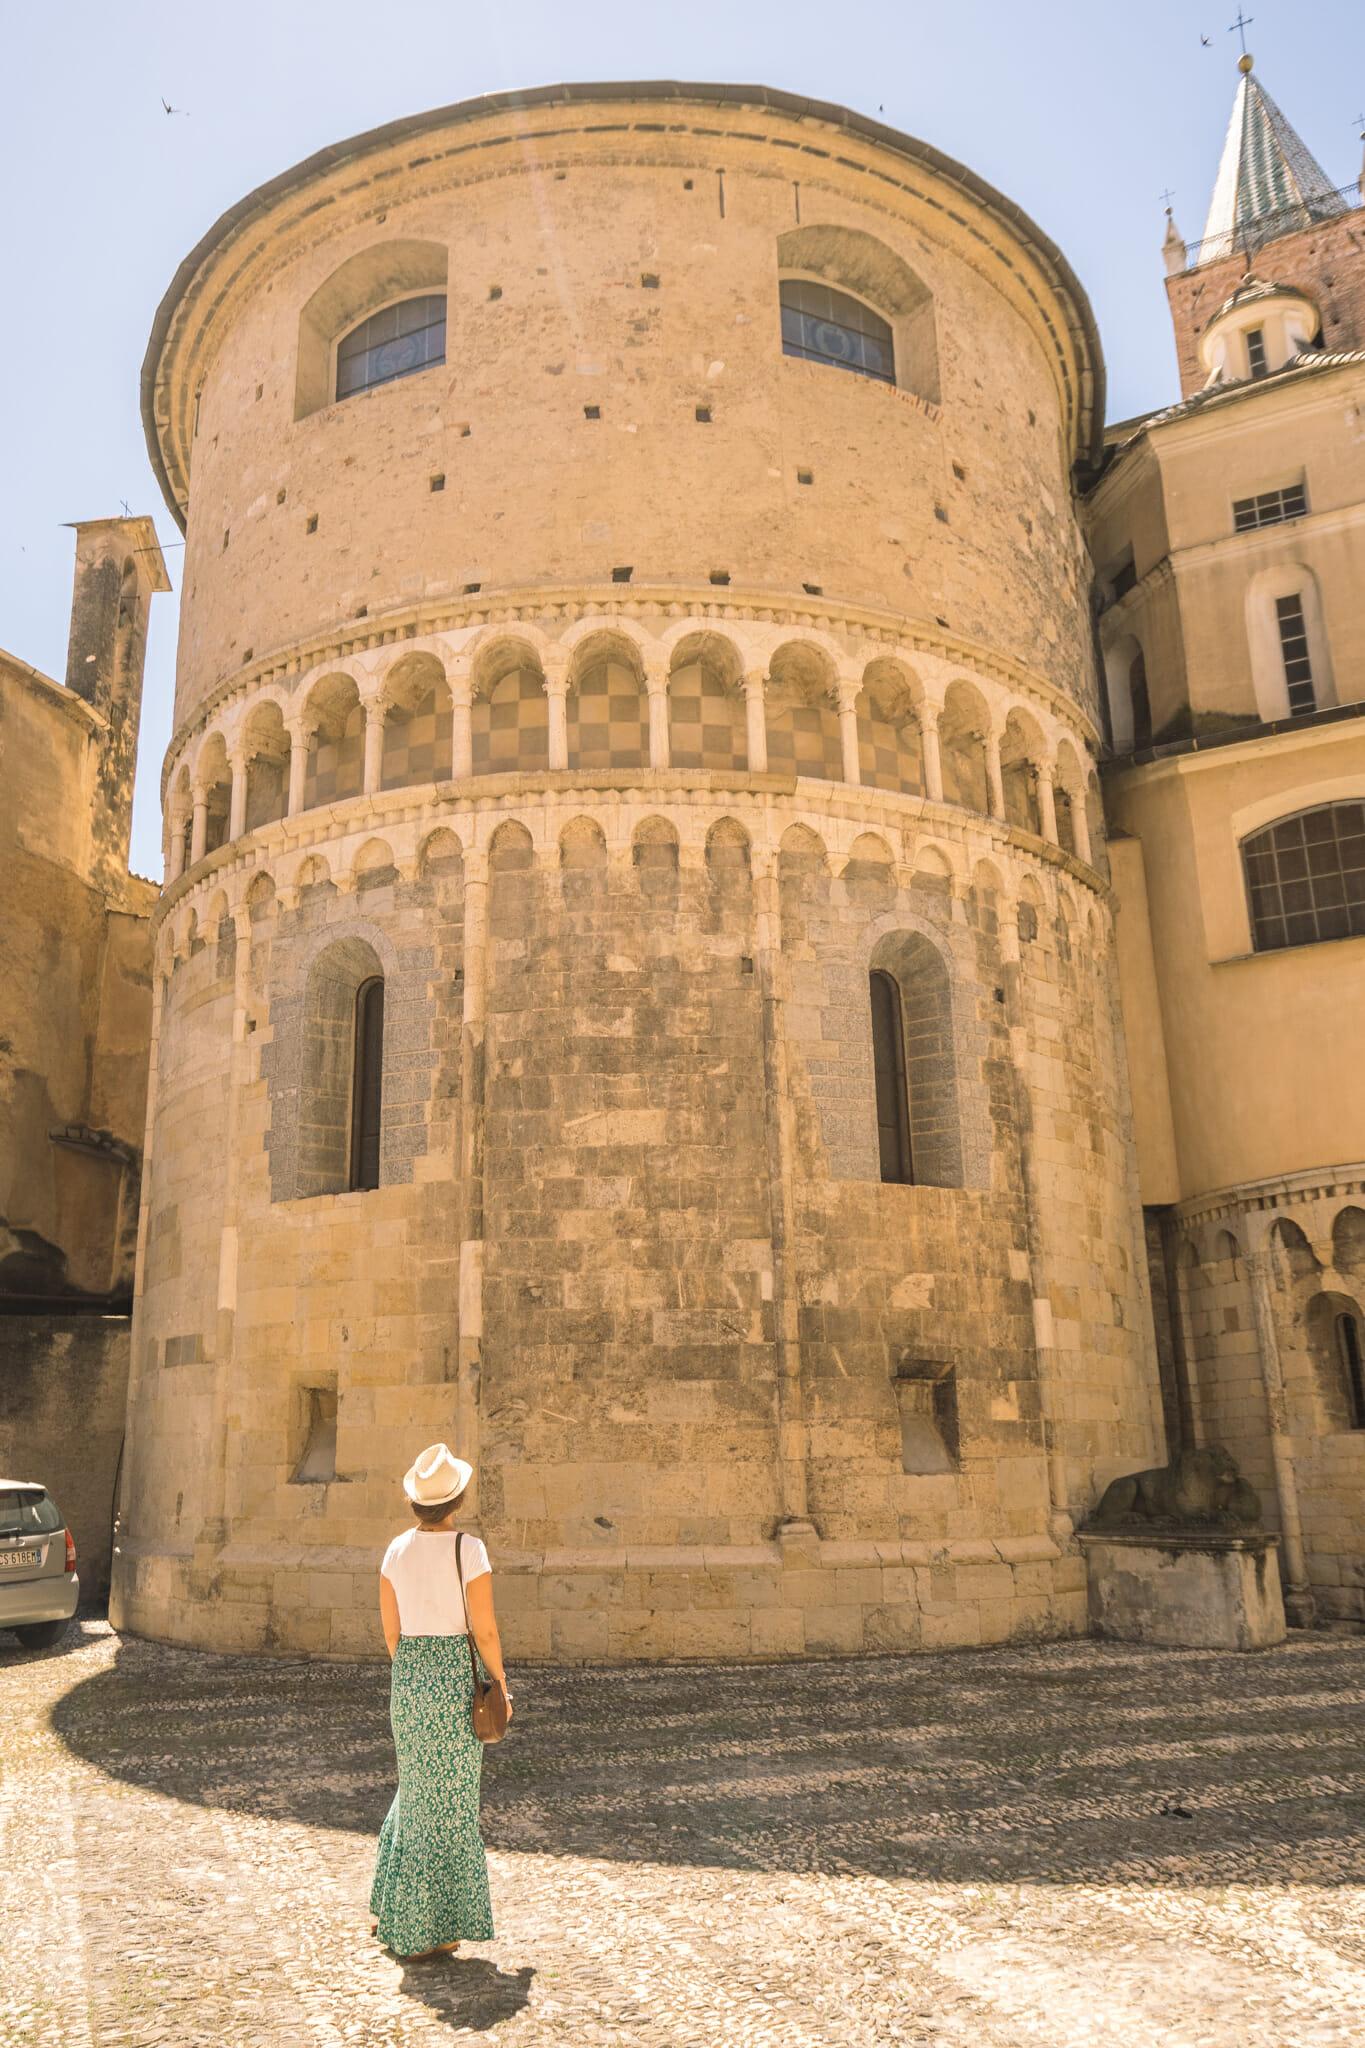 Balade dans les rues pittoresques d'Albenga